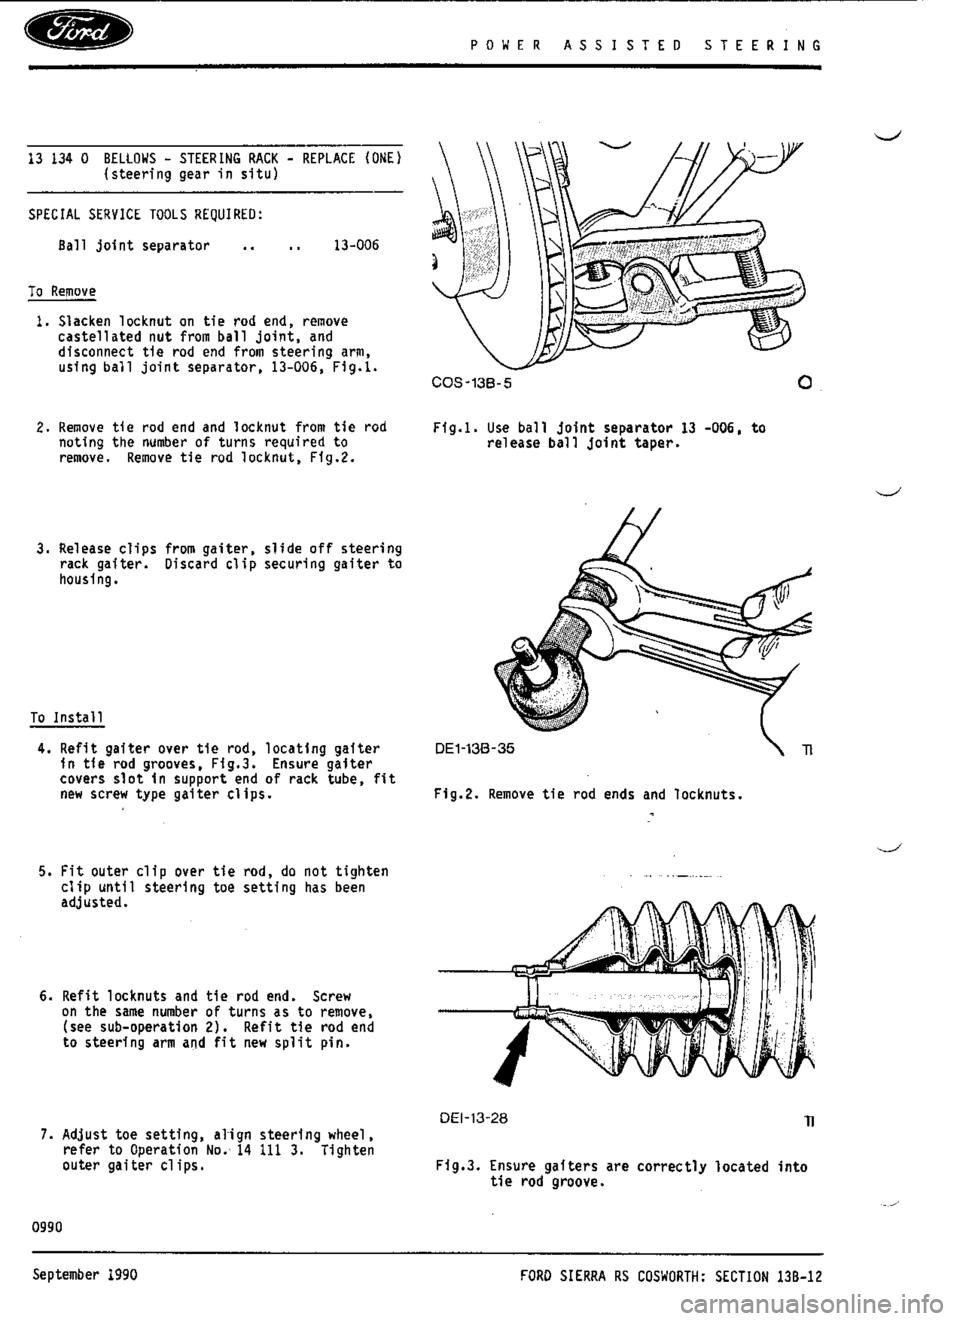 Ford Sierra Rs Cosworth 1987 1g Workshop Manual 2015 F650 Wiring Diagram Pin 87